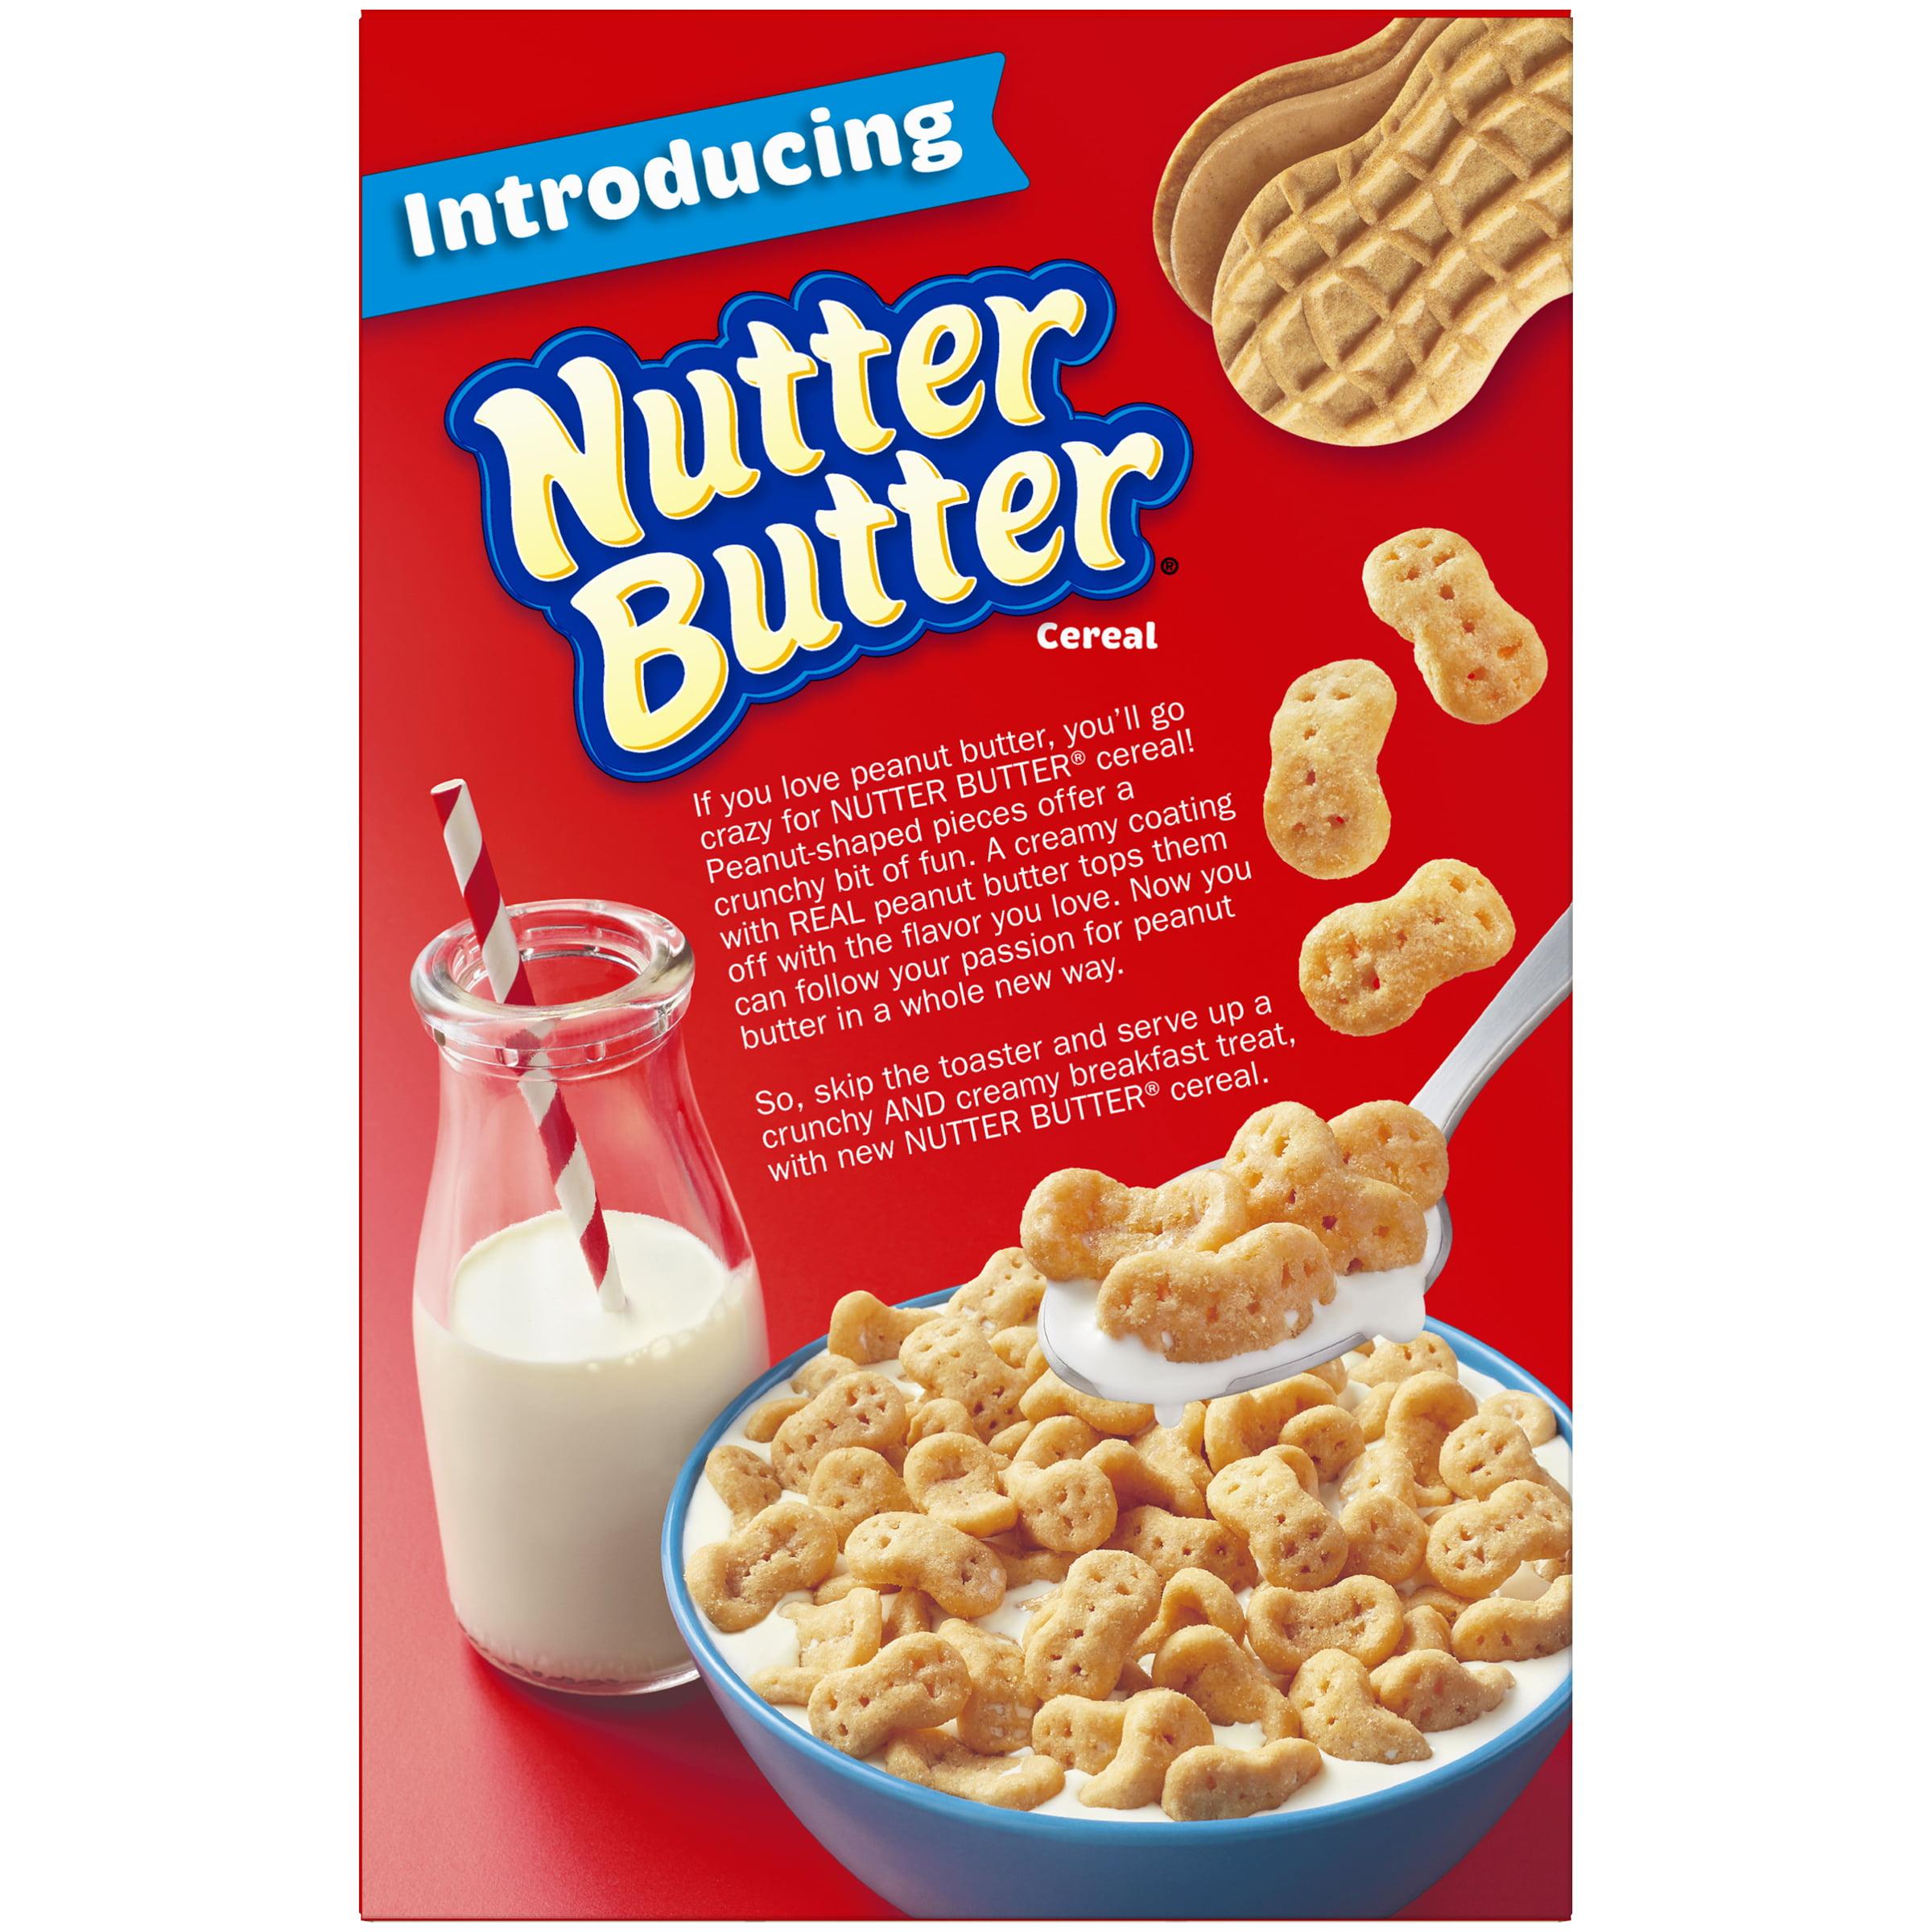 Post nutter butter breakfast cereal peanut butter 19 oz walmart ccuart Images